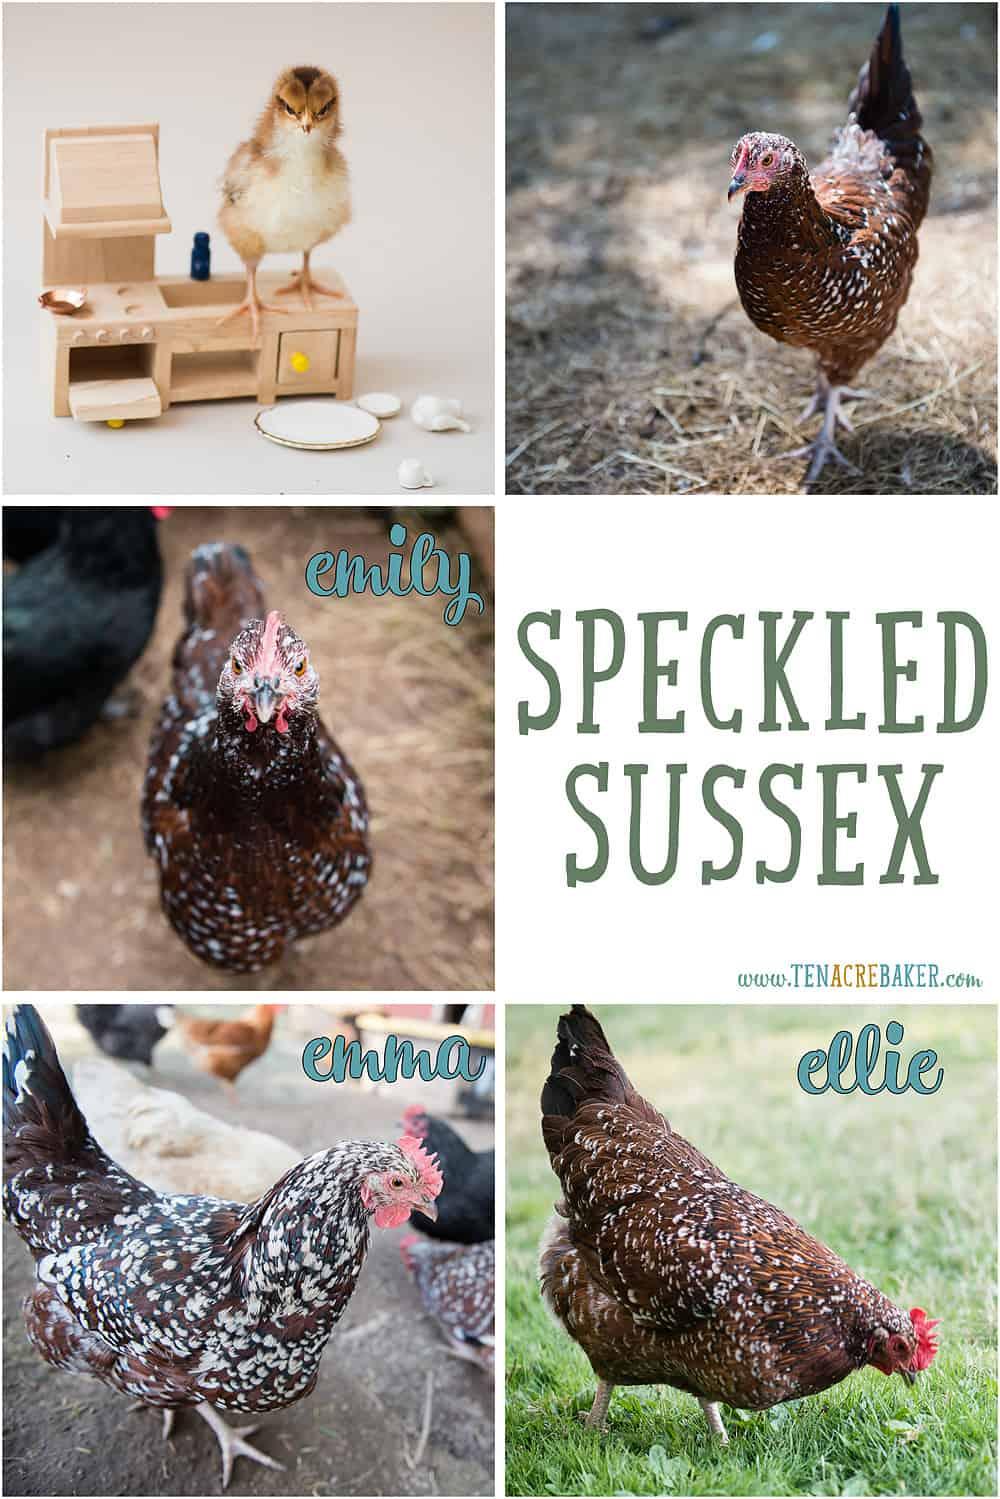 Speckled Sussex backyard chickens